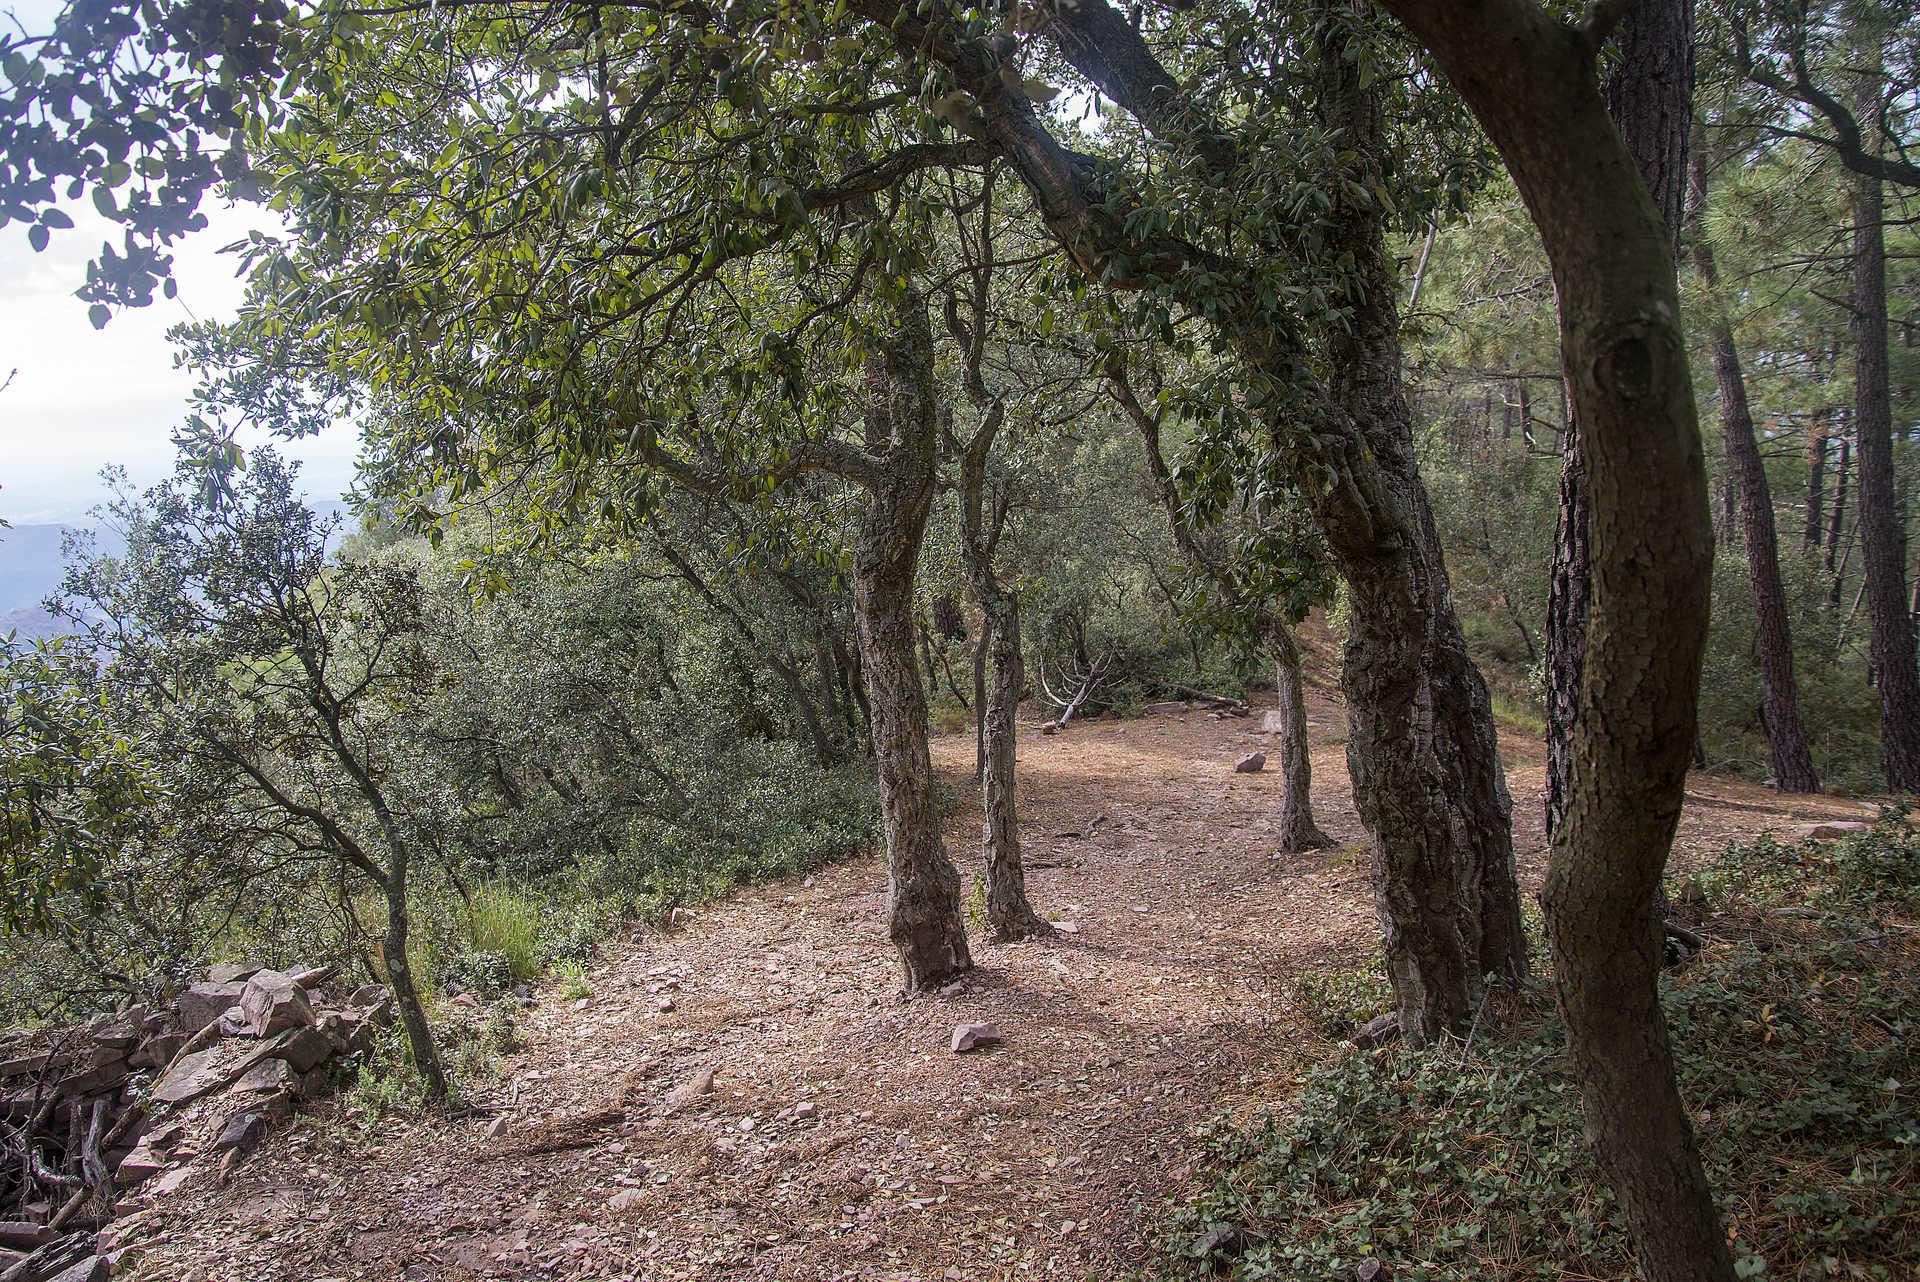 Parque Natural de la Sierra de Espadán